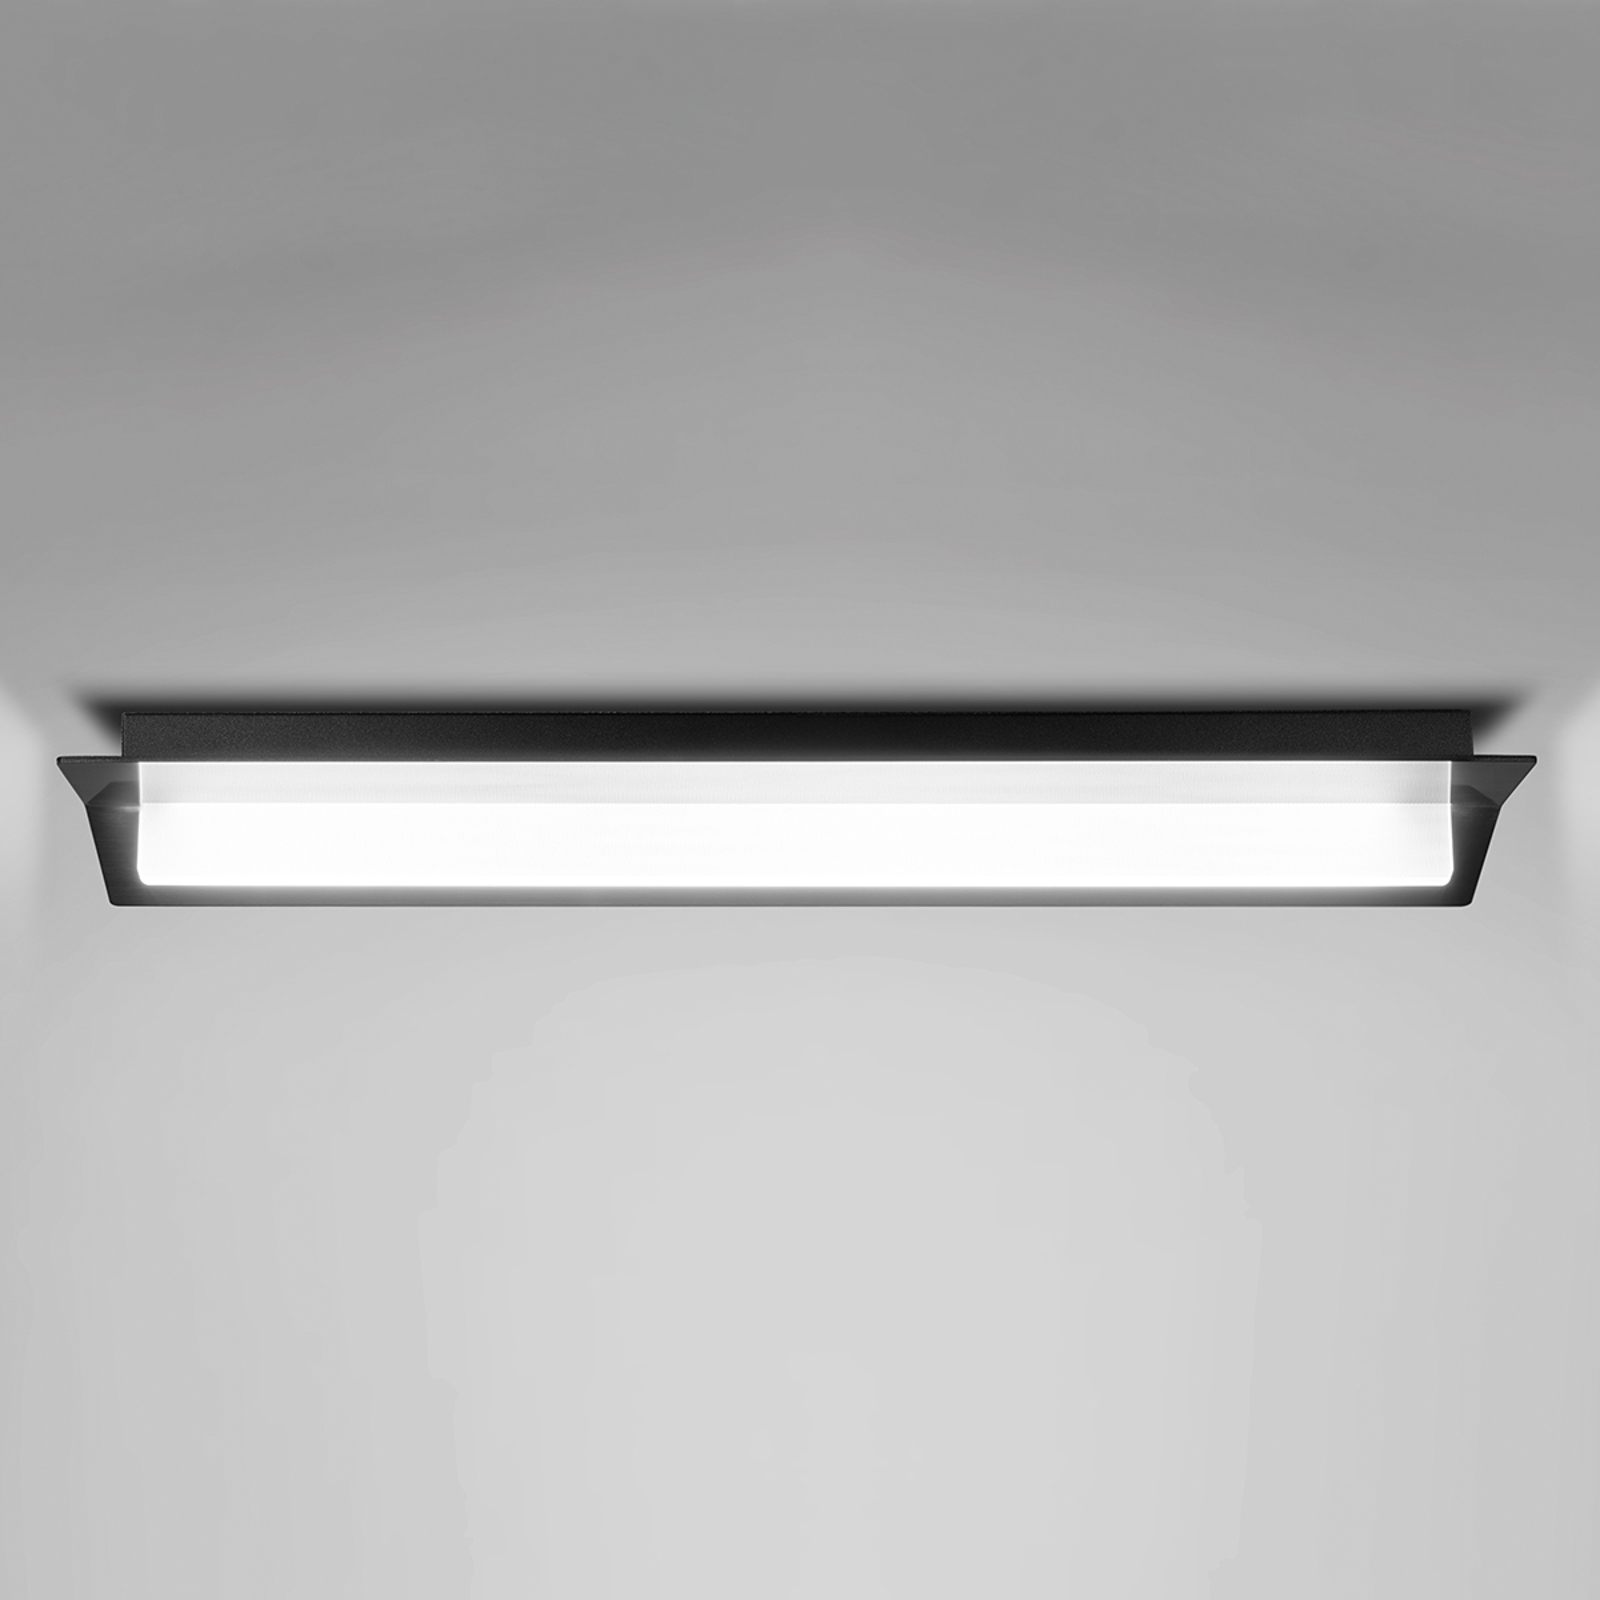 LED plafondlamp Flurry, 100 cm, zwart